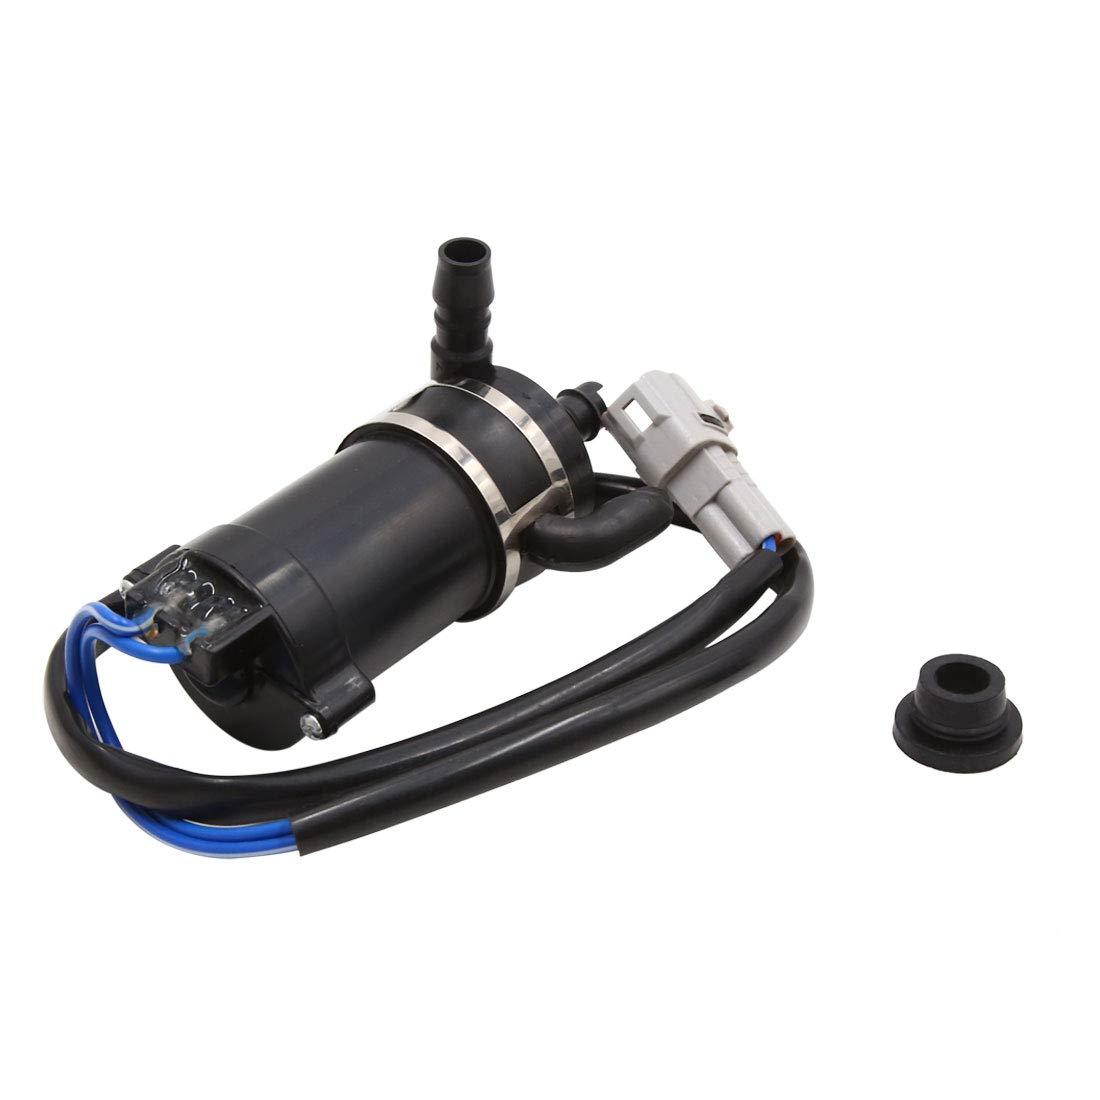 uxcell Plasitc Windshield Wiper Washer Fluid Pump w Grommet for Mitsubishi Pajero